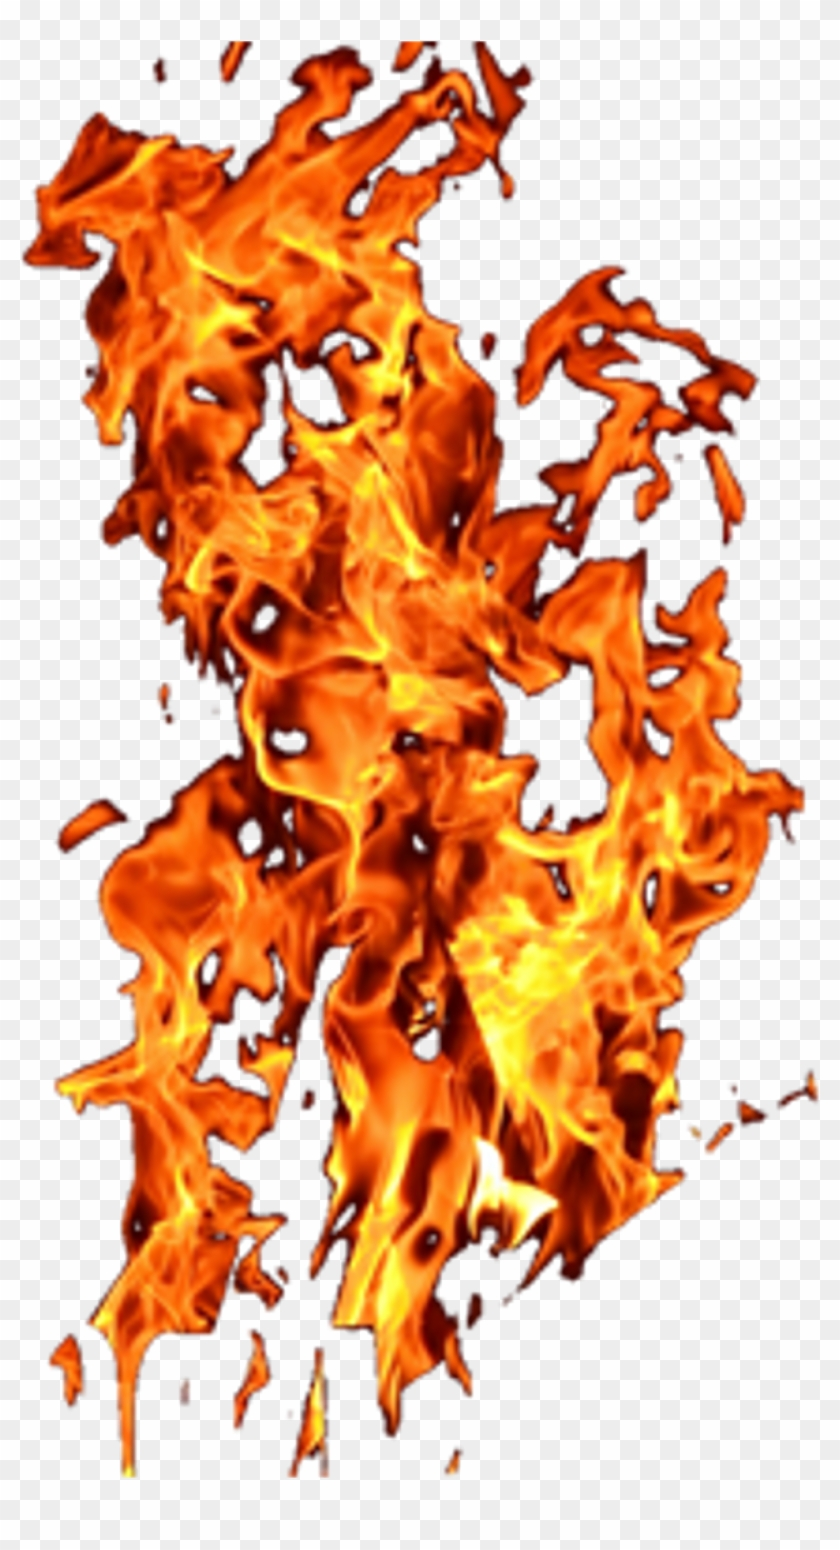 Match Clipart Fire Spark - Clip Art, HD Png Download